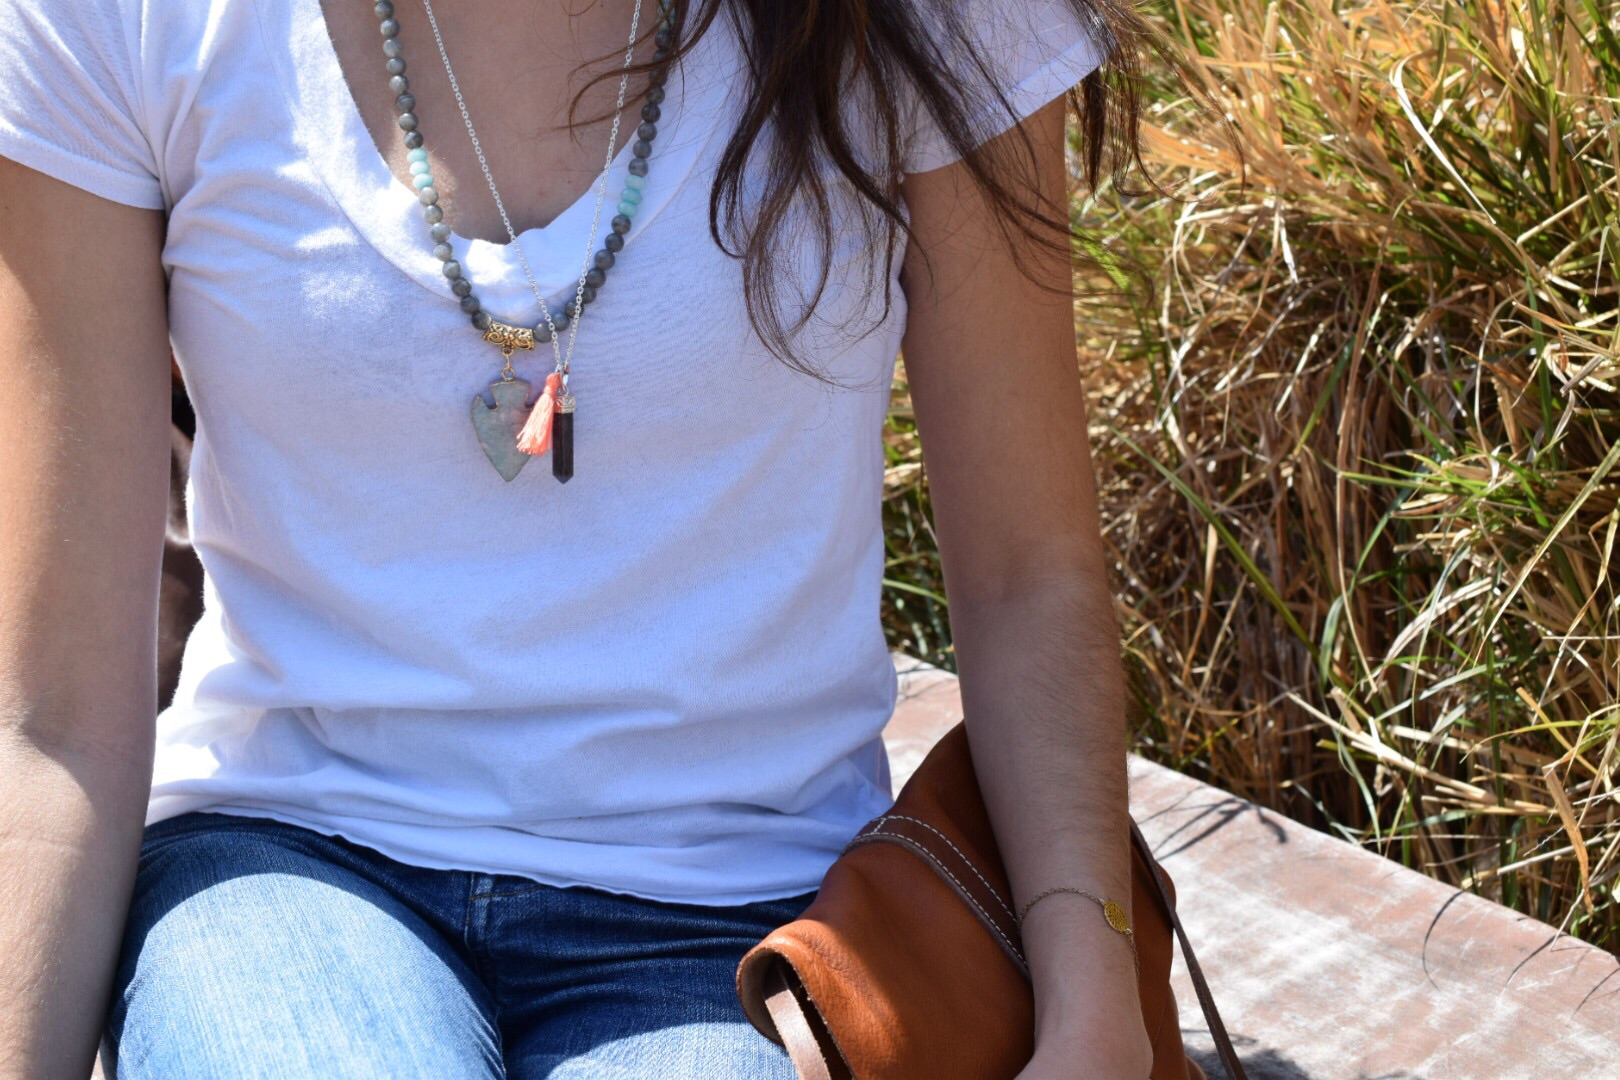 Some of the new pieces, labradorite arrowhead necklace and the tassel Quartz pendant.